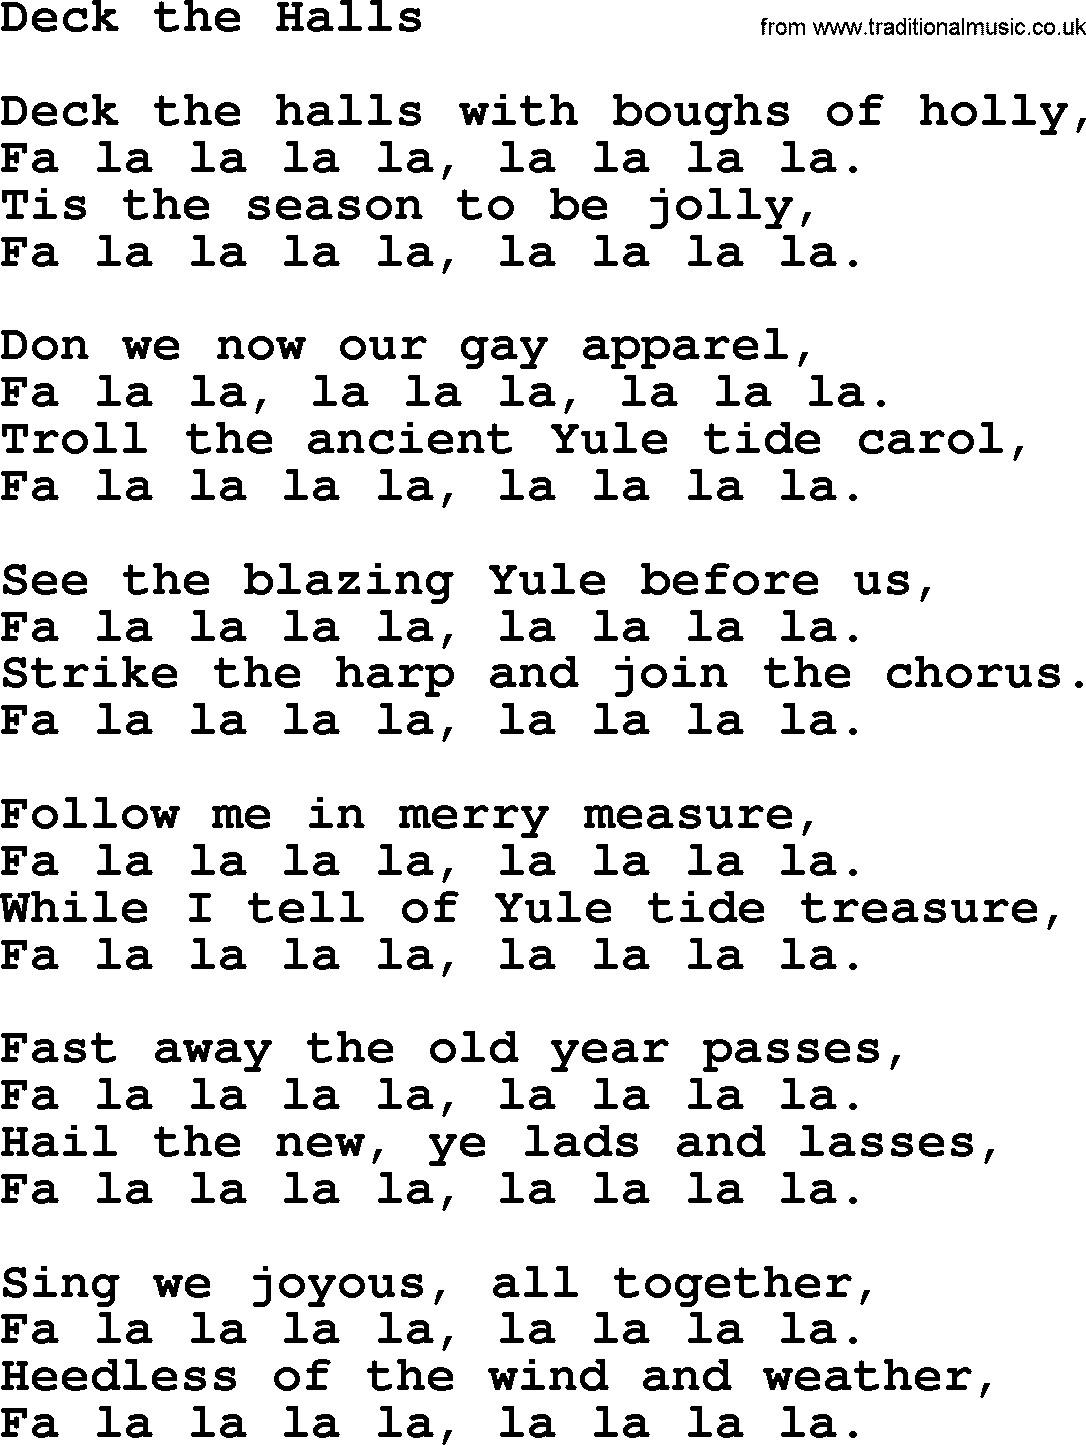 Deck The Halls Christmas Song  Christmas Hymns Carols and Songs title Deck The Halls